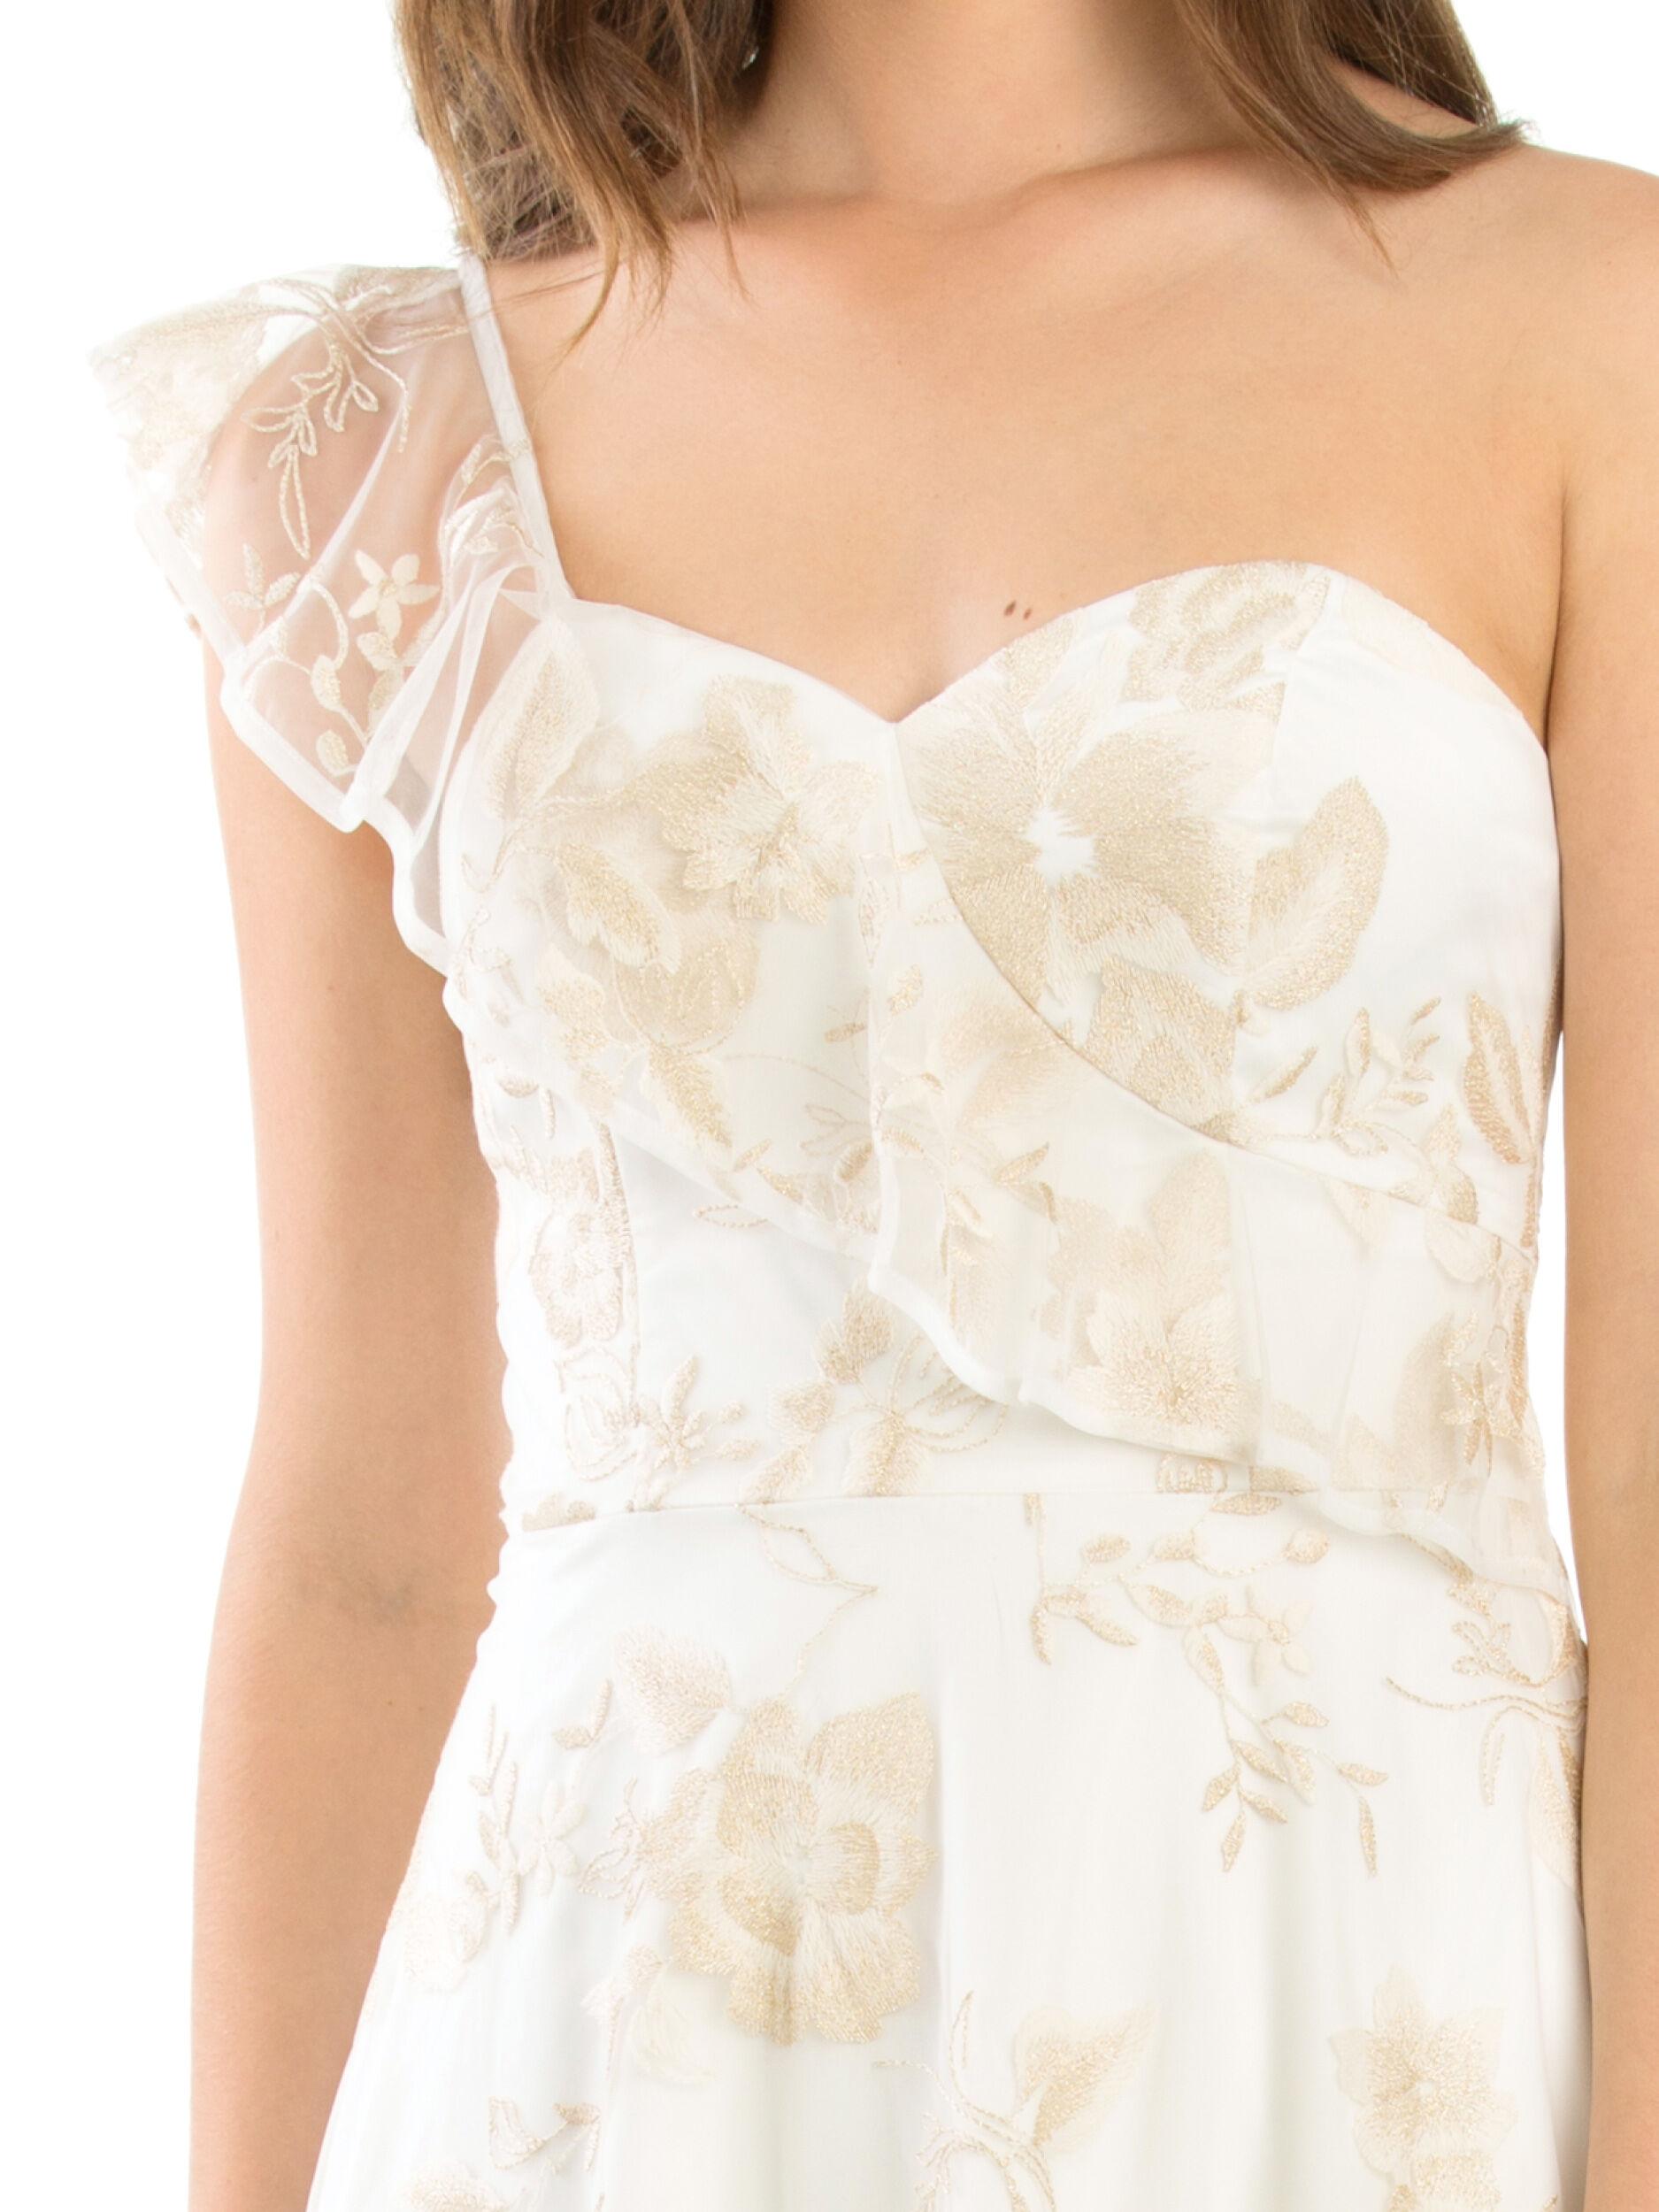 Rosie Eve Dress